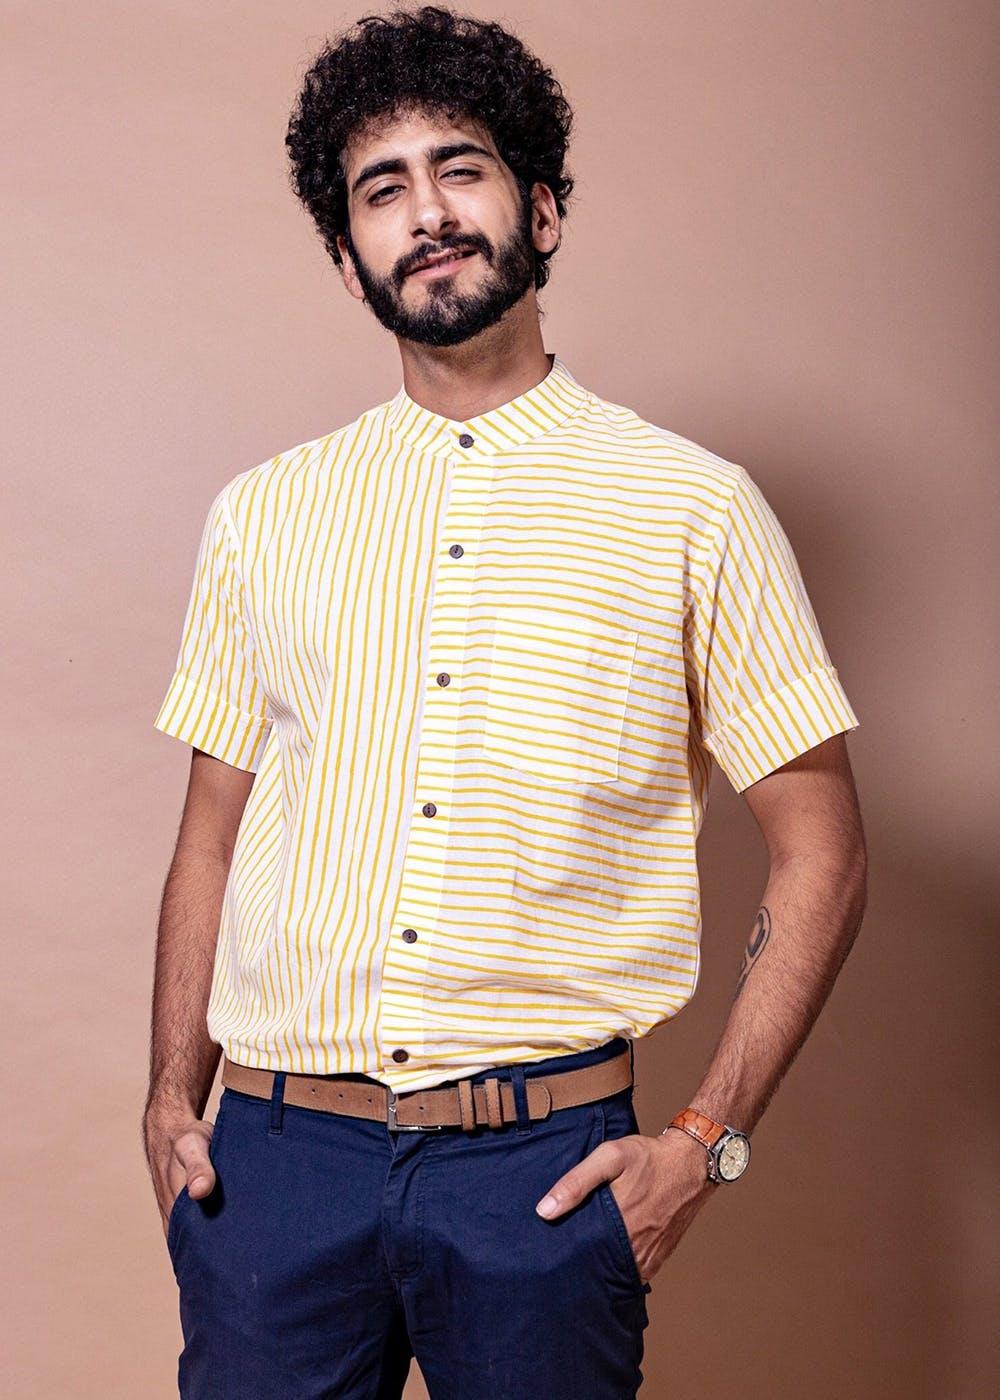 Patch Pocket Detail Striped Yellow Shirt